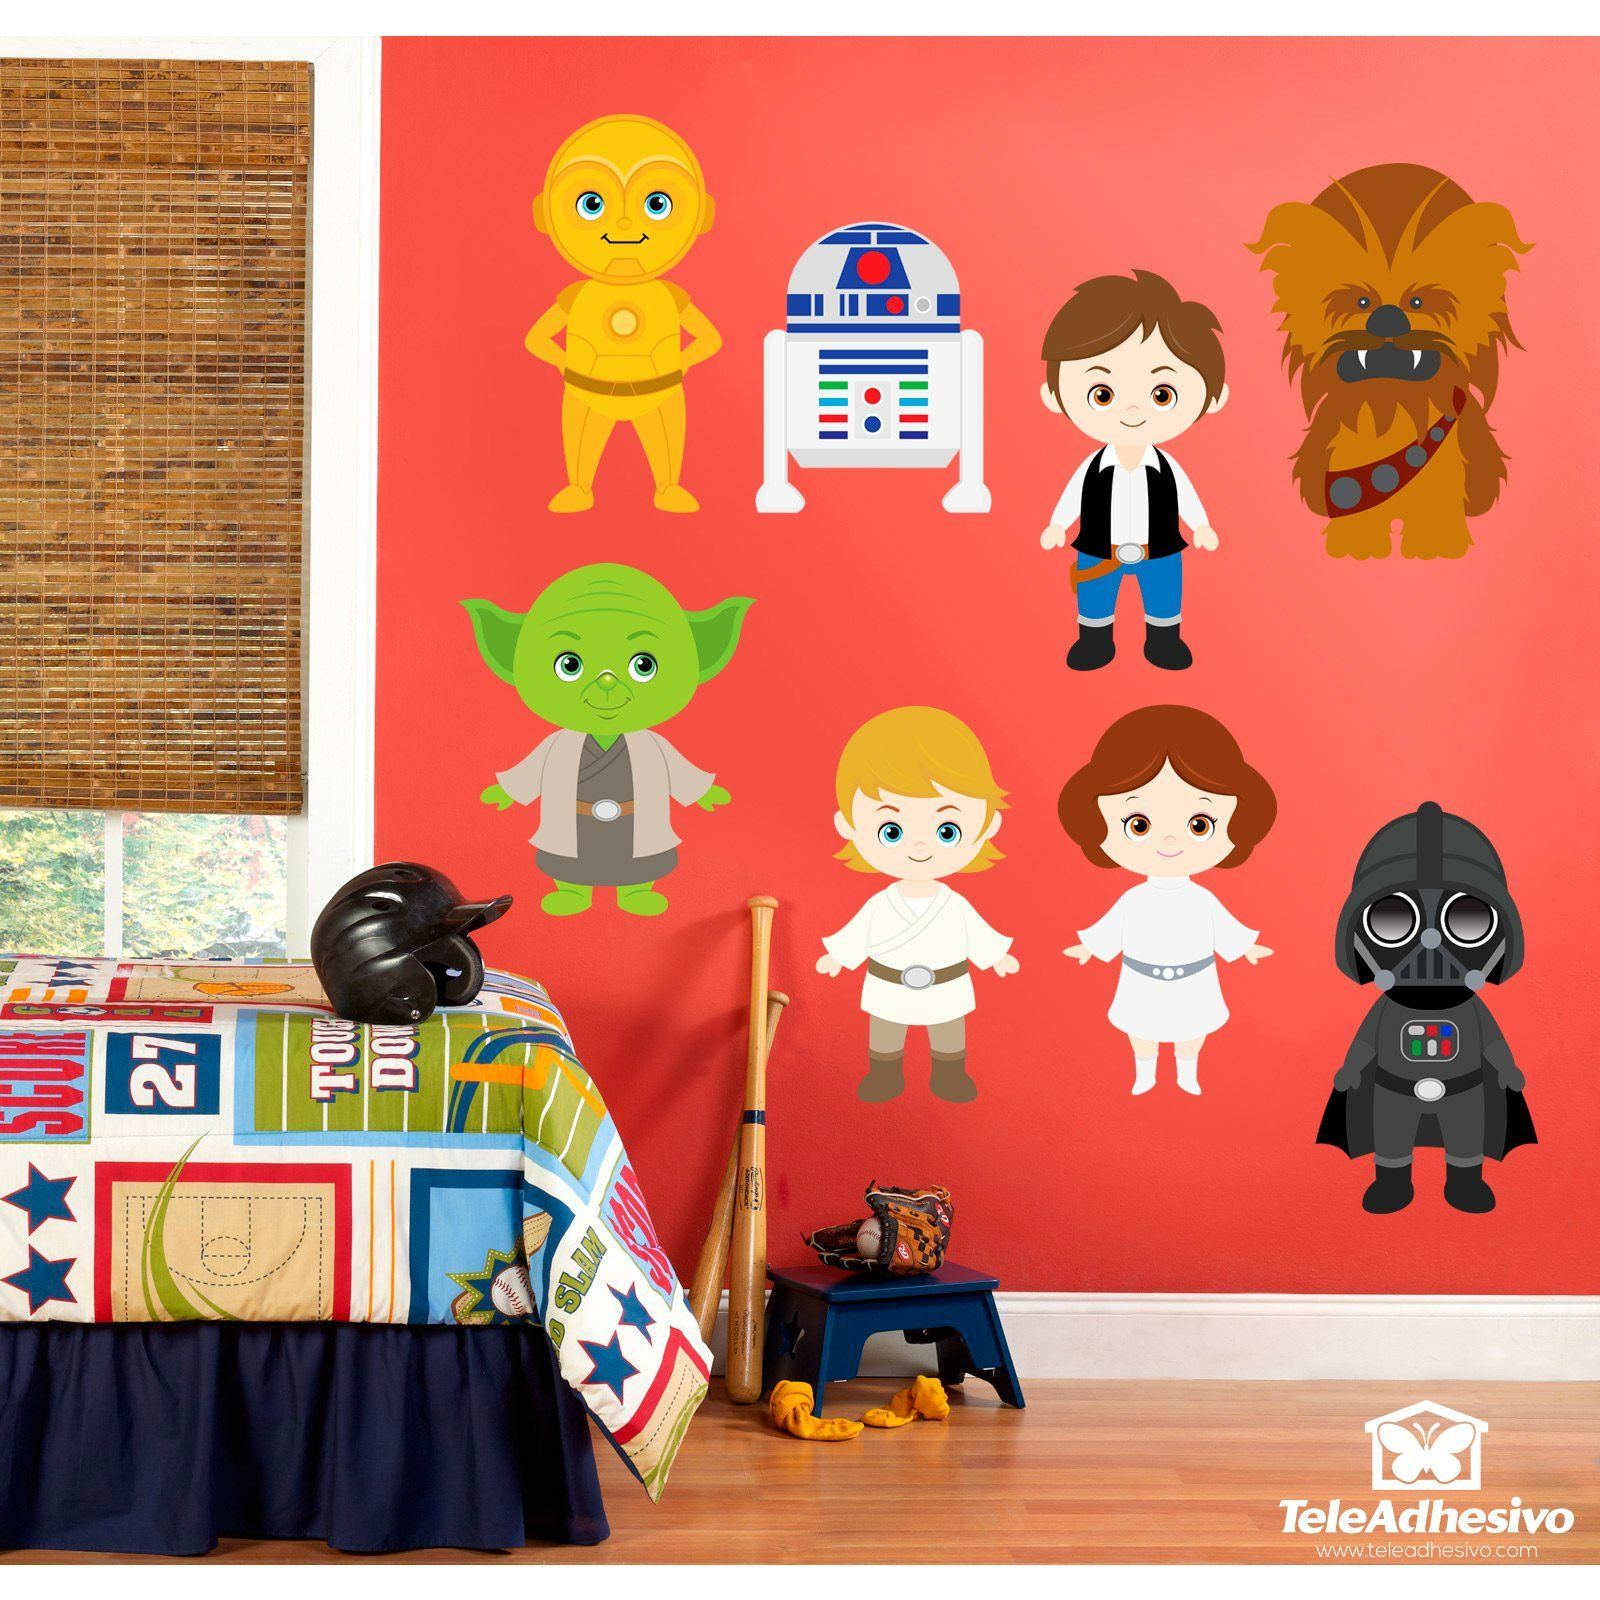 Star wars kit stickers for kids star wars kit amipublicfo Gallery